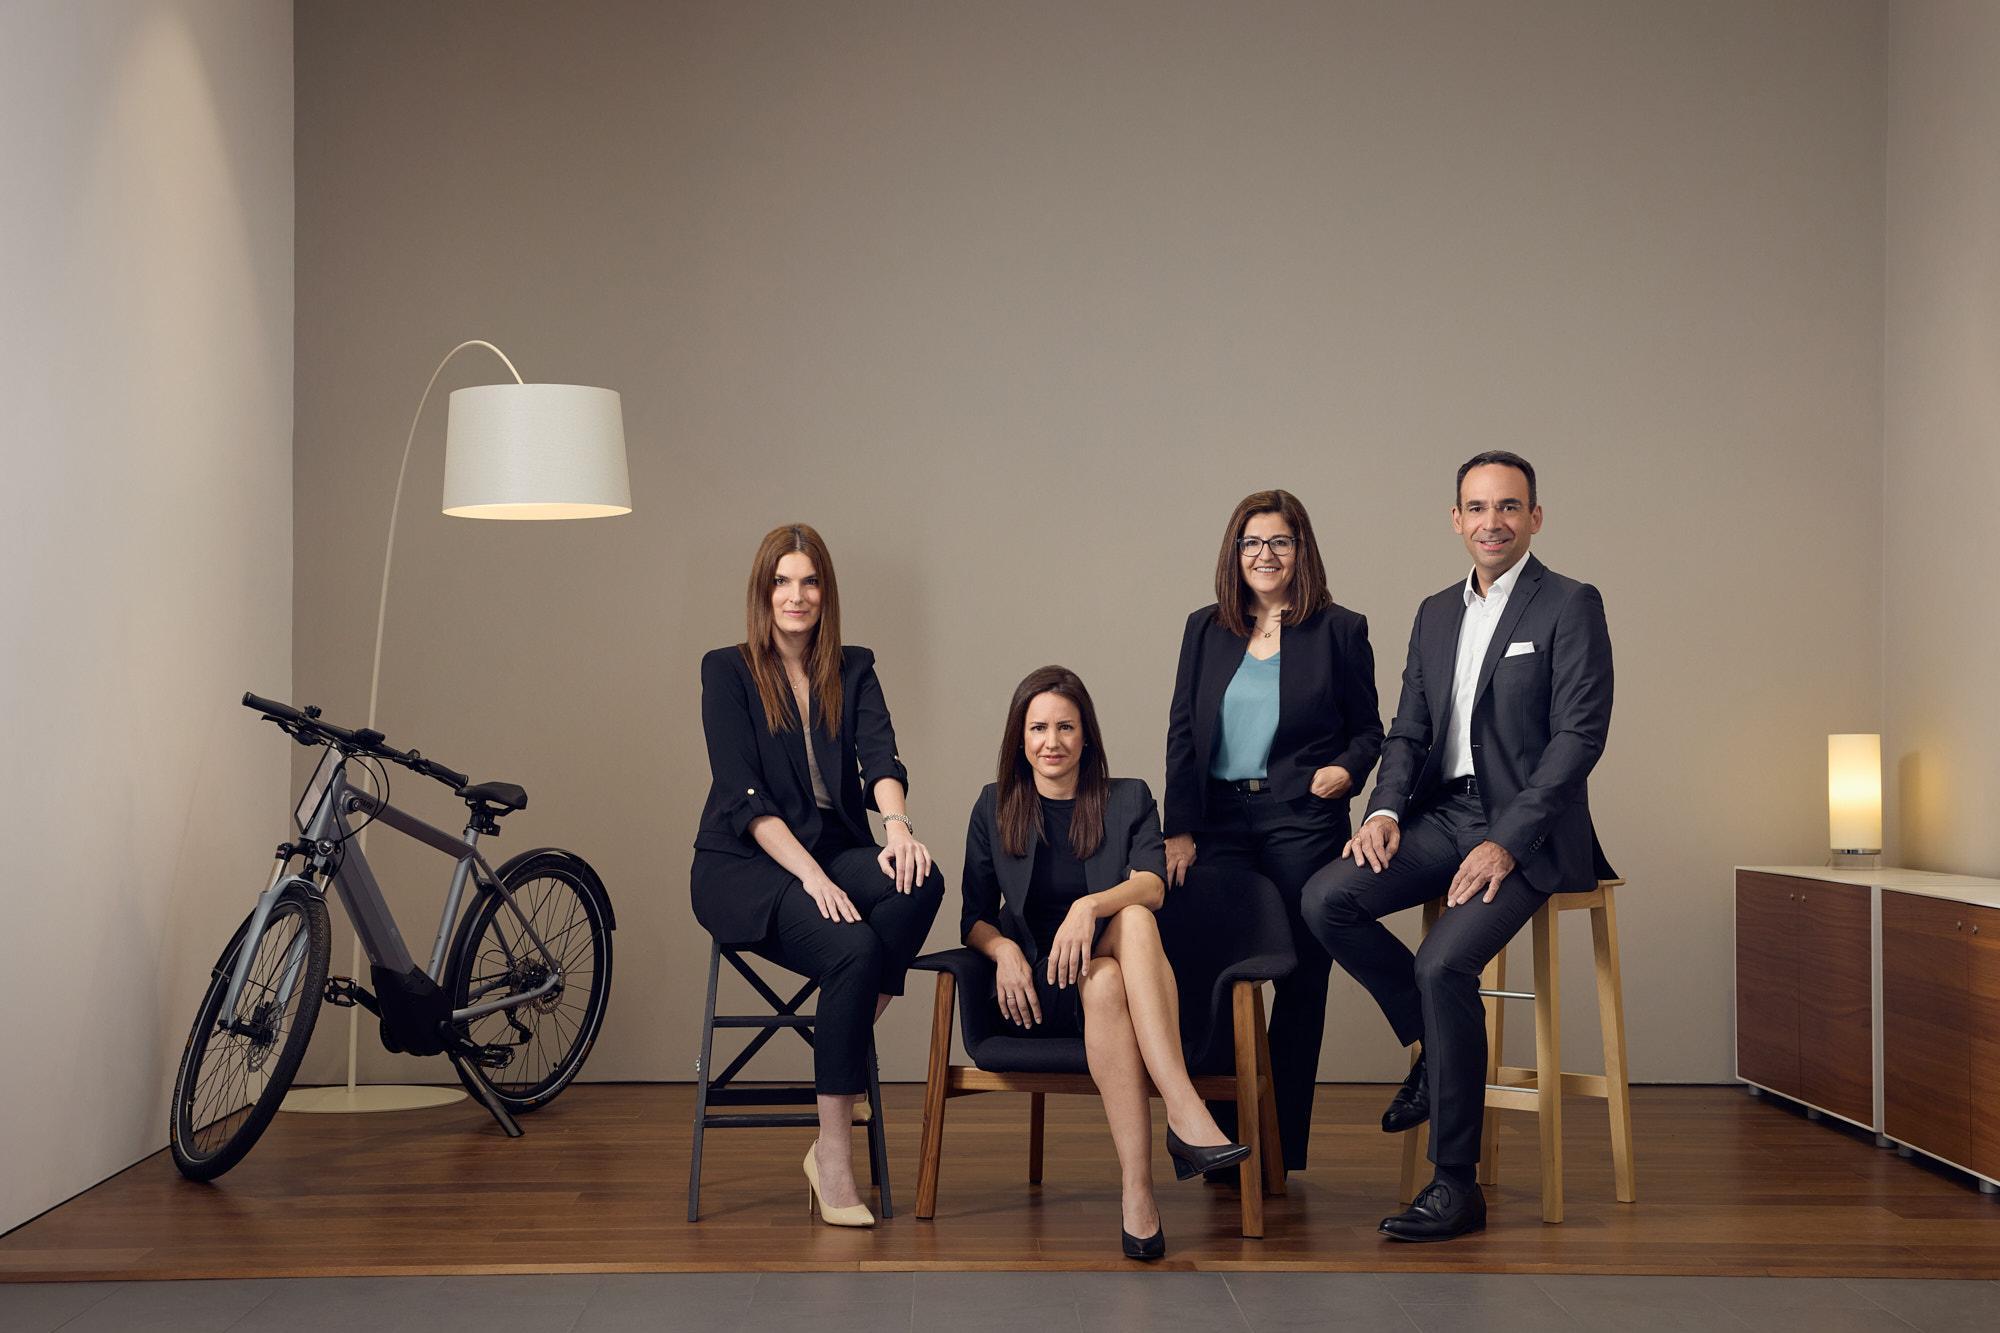 BMW Group Hellas: Εκπροσώπηση γυναικών σε υψηλόβαθμες διοικητικές θέσεις